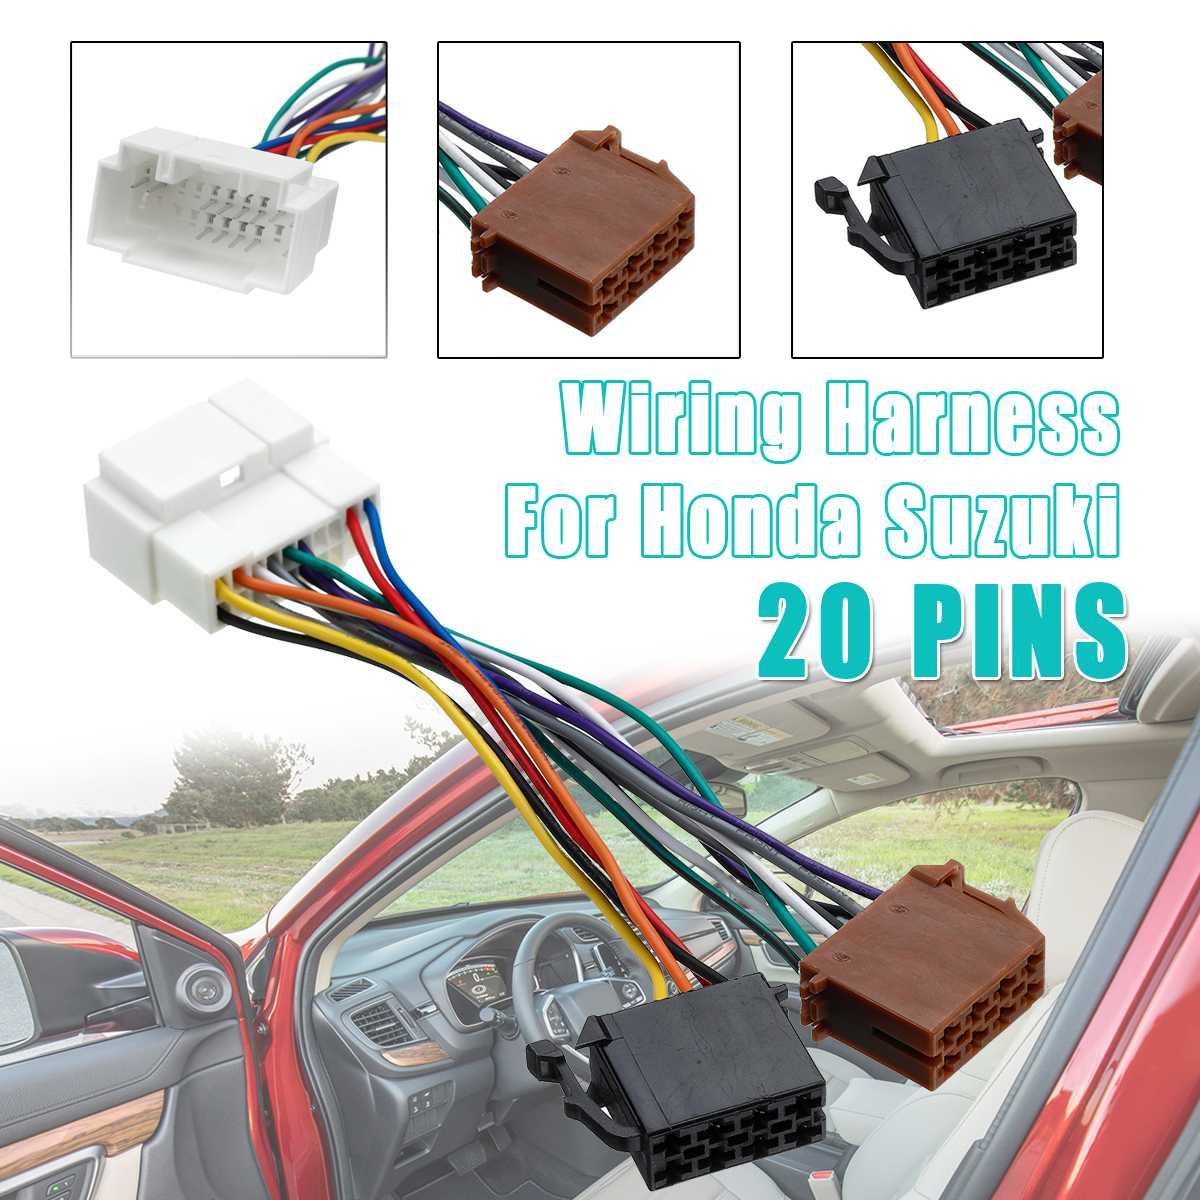 Suzuki Swift CD radio stereo wiring harness adapter lead loom ISO converter wire